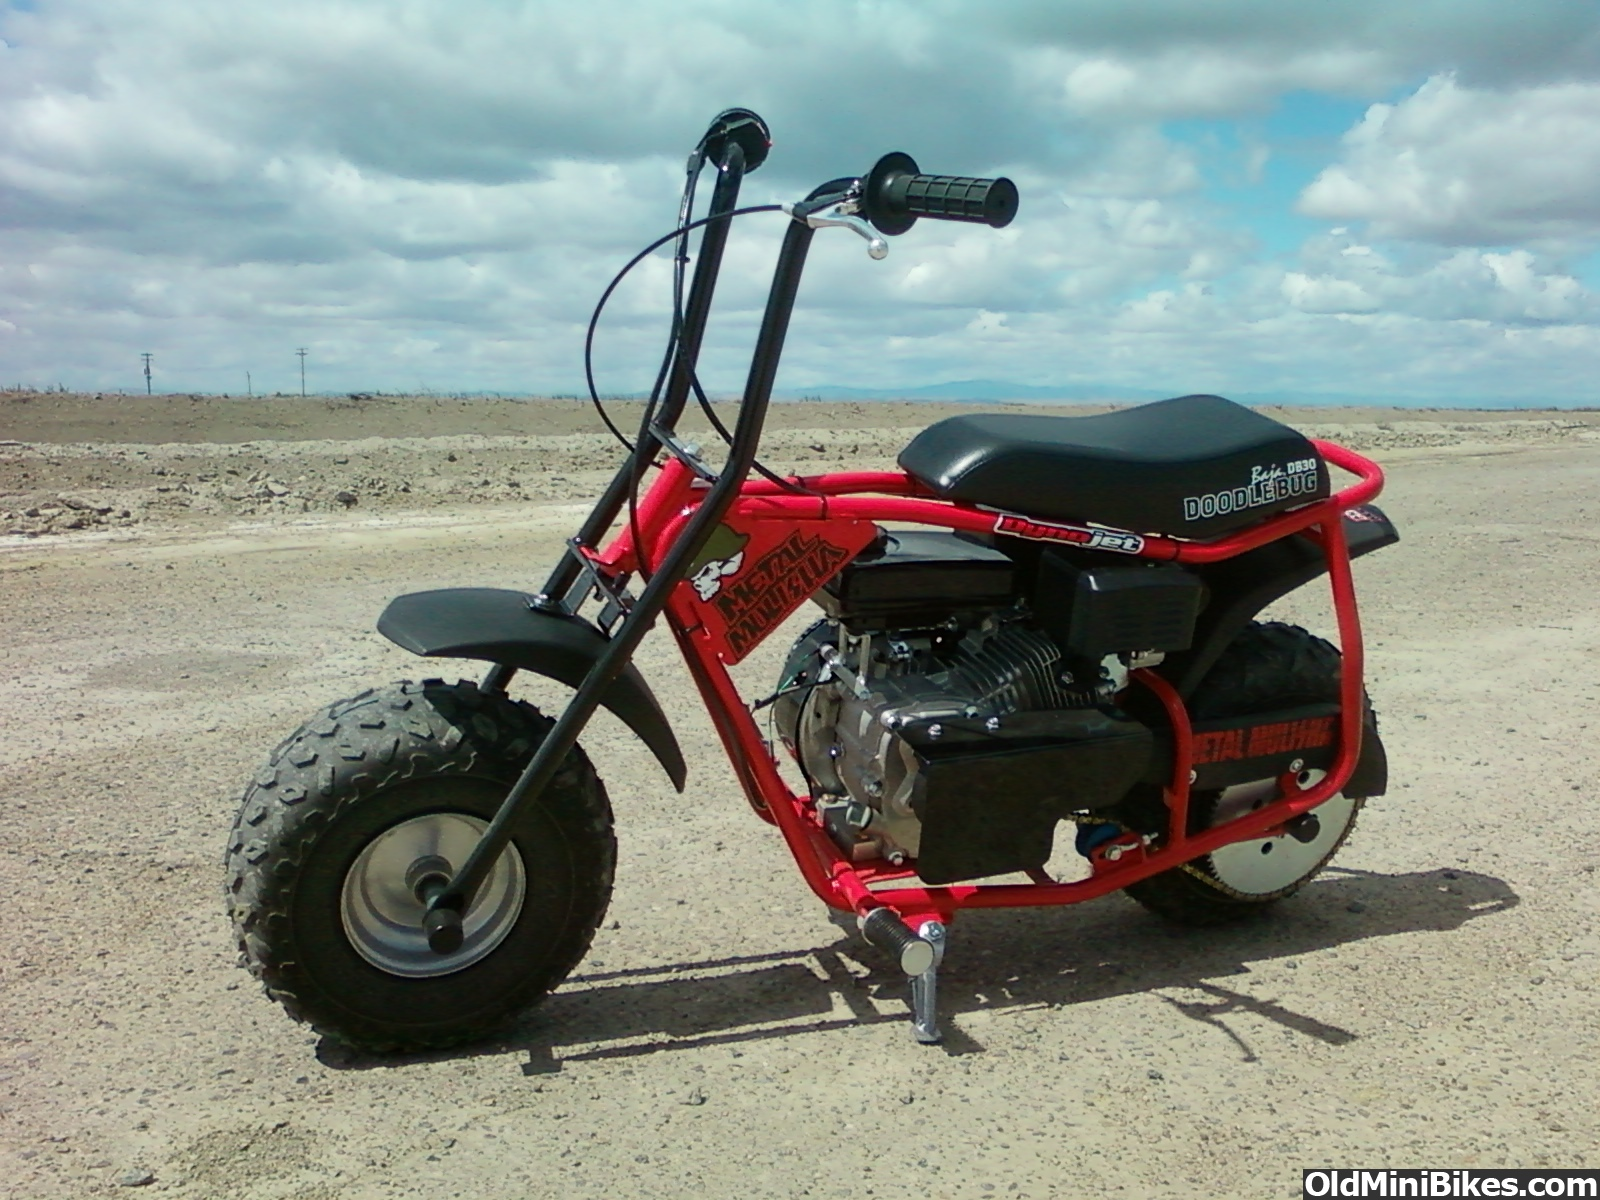 Doodlebug Mini Bike Engine Swap - #GolfClub